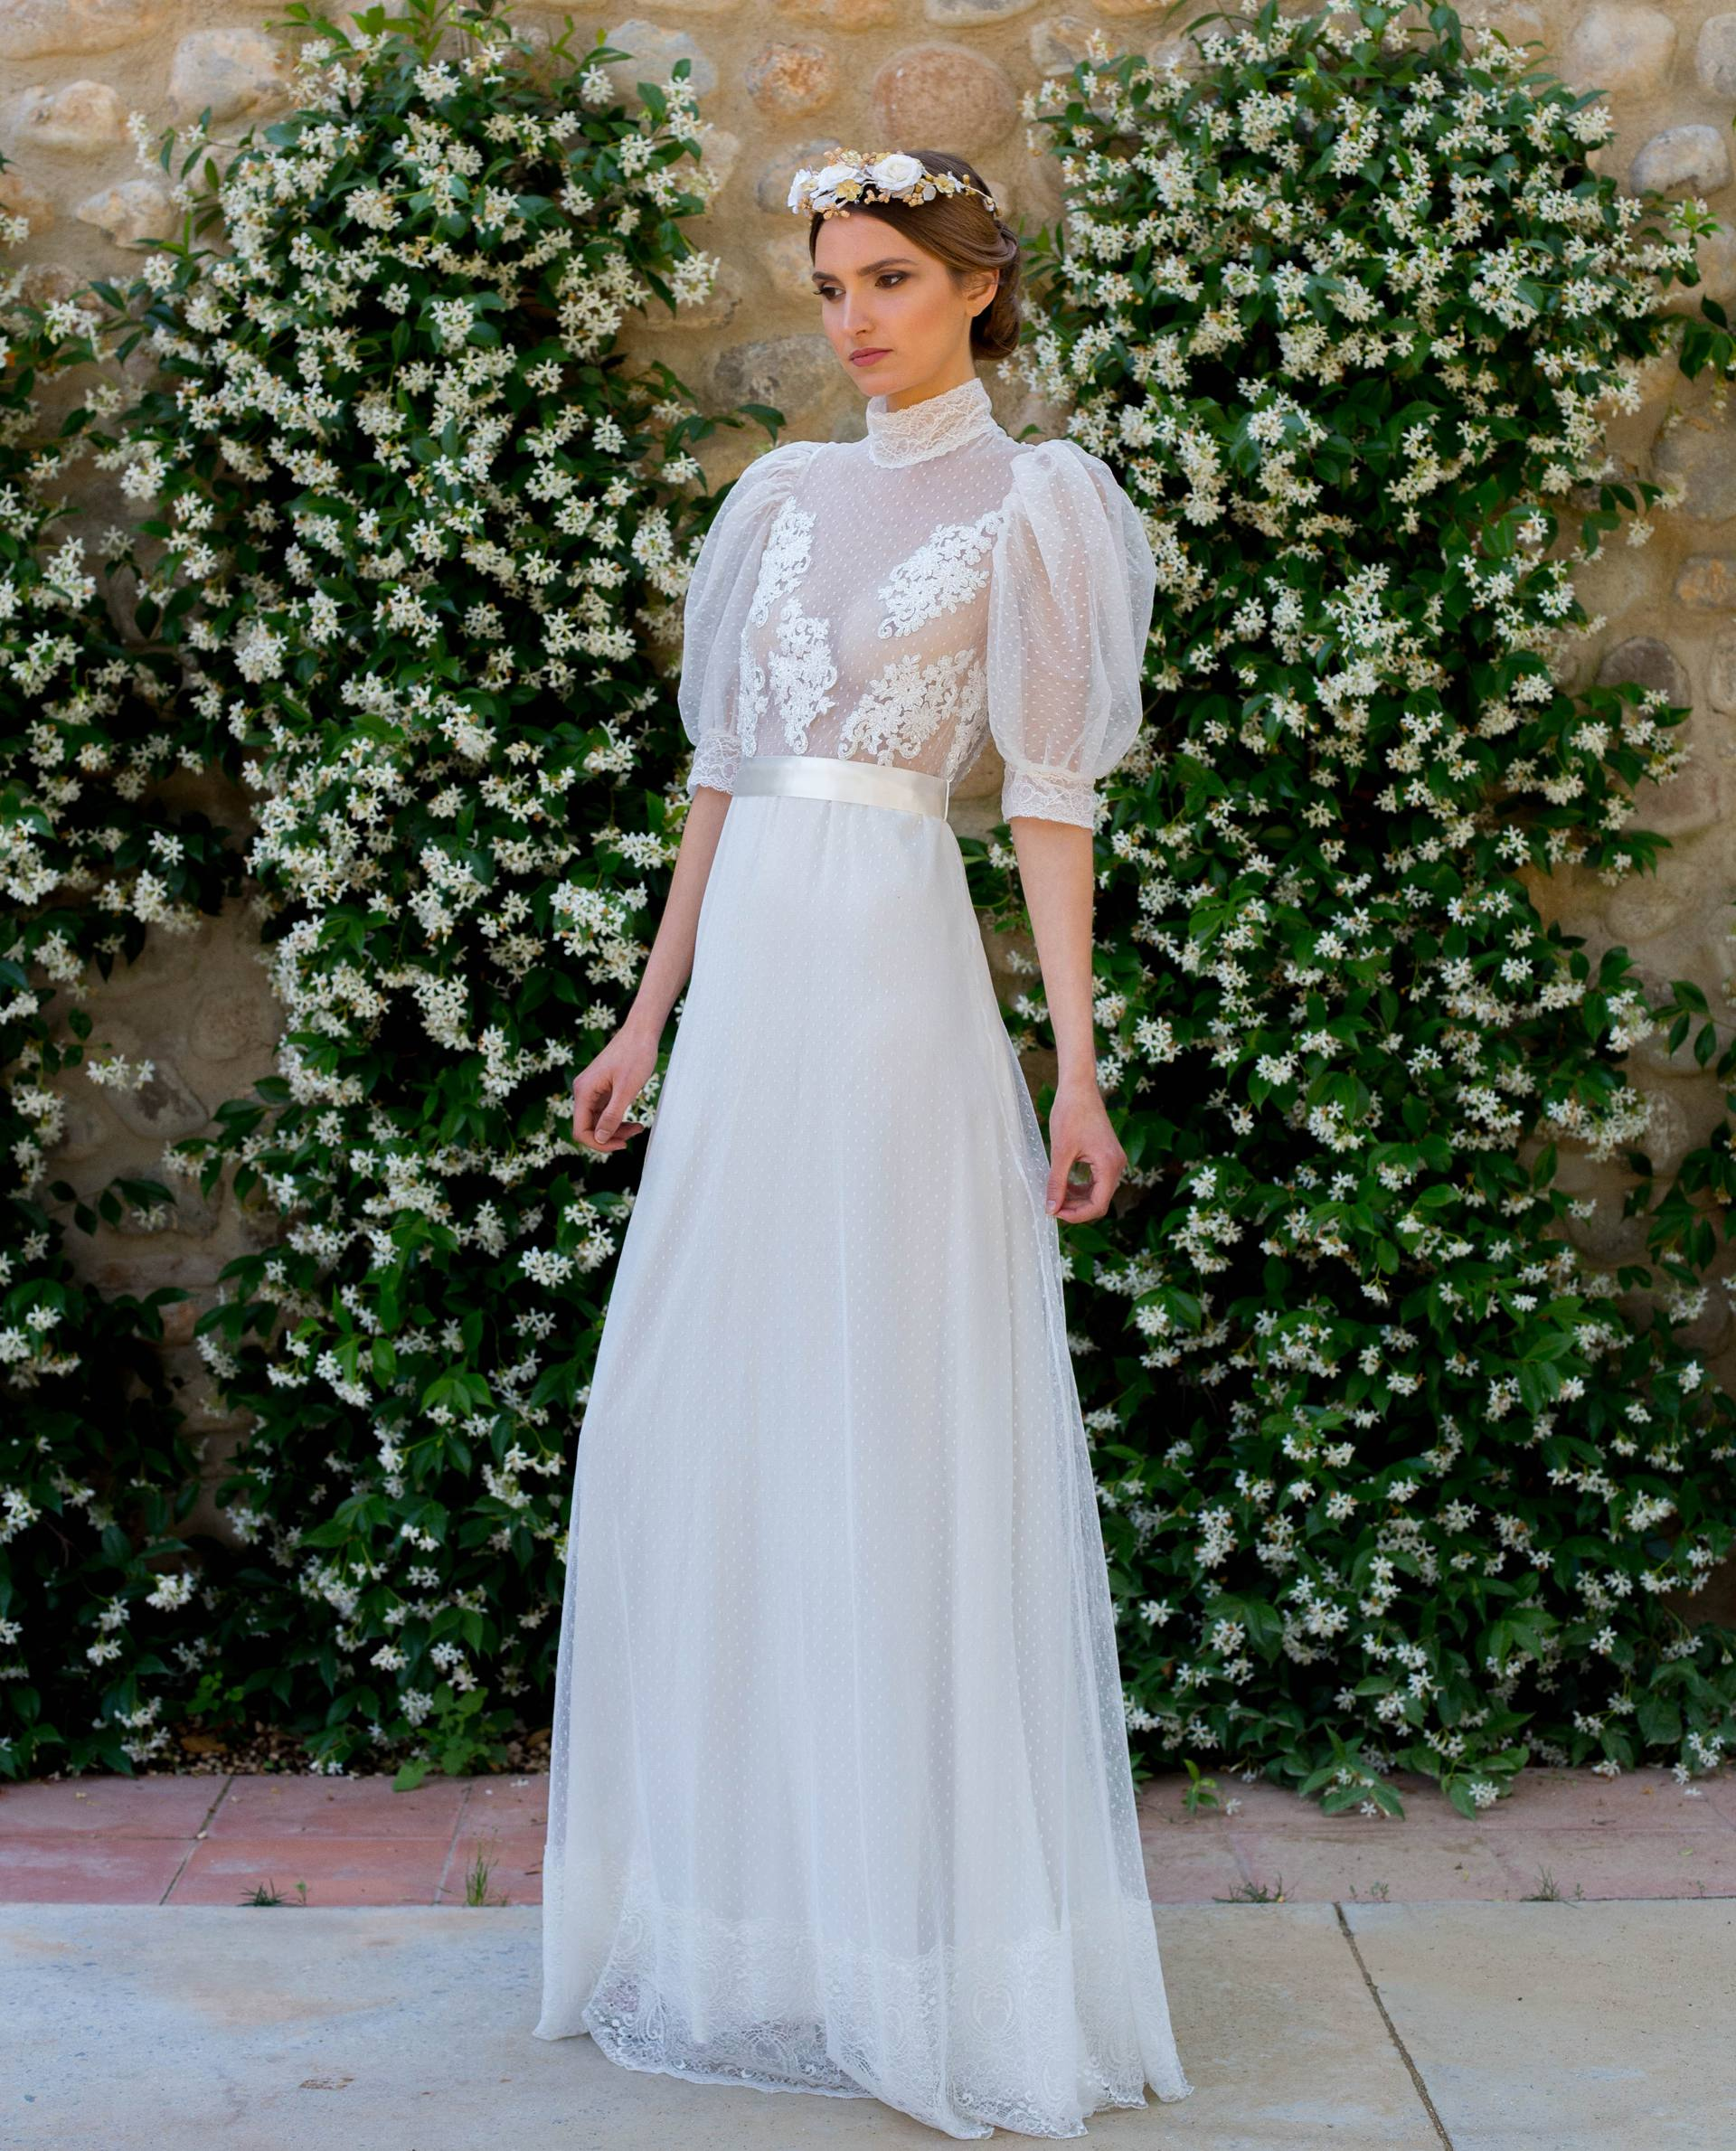 BRIDAL-NATURE 2018/19 - VESTIDOS - vestido novia Carmen